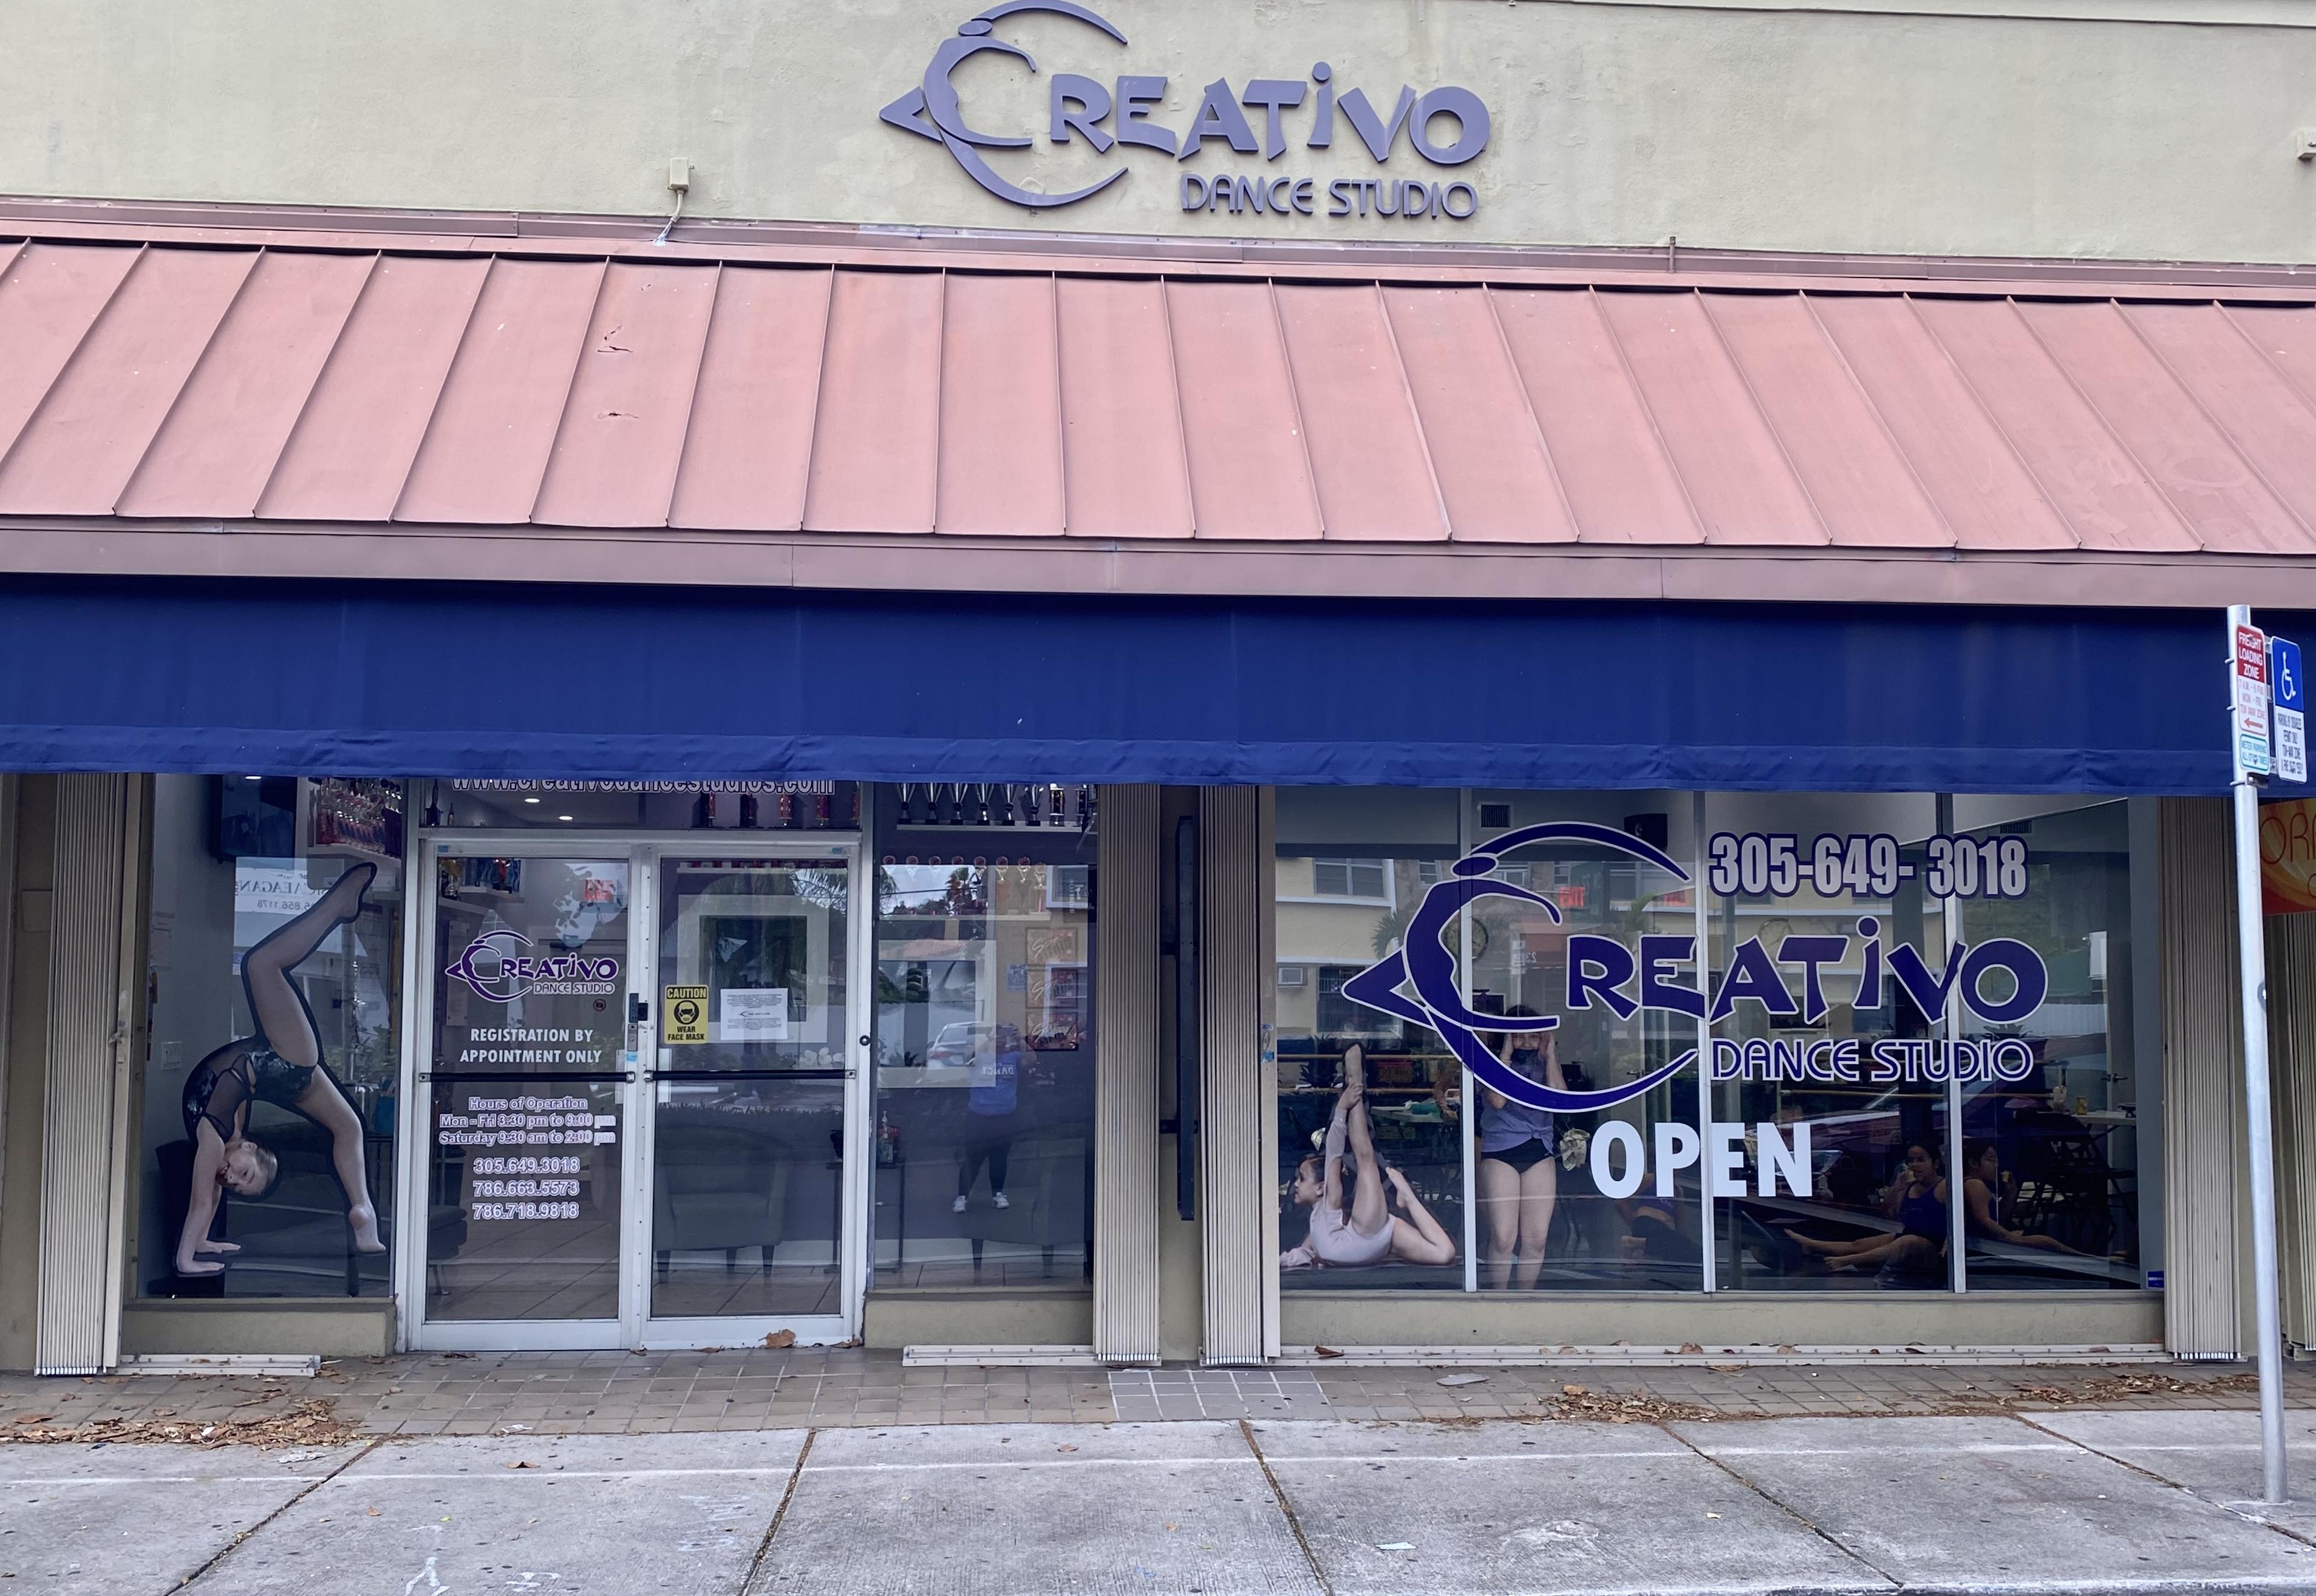 Storefront of Creativo Dance Studio in Coral Way